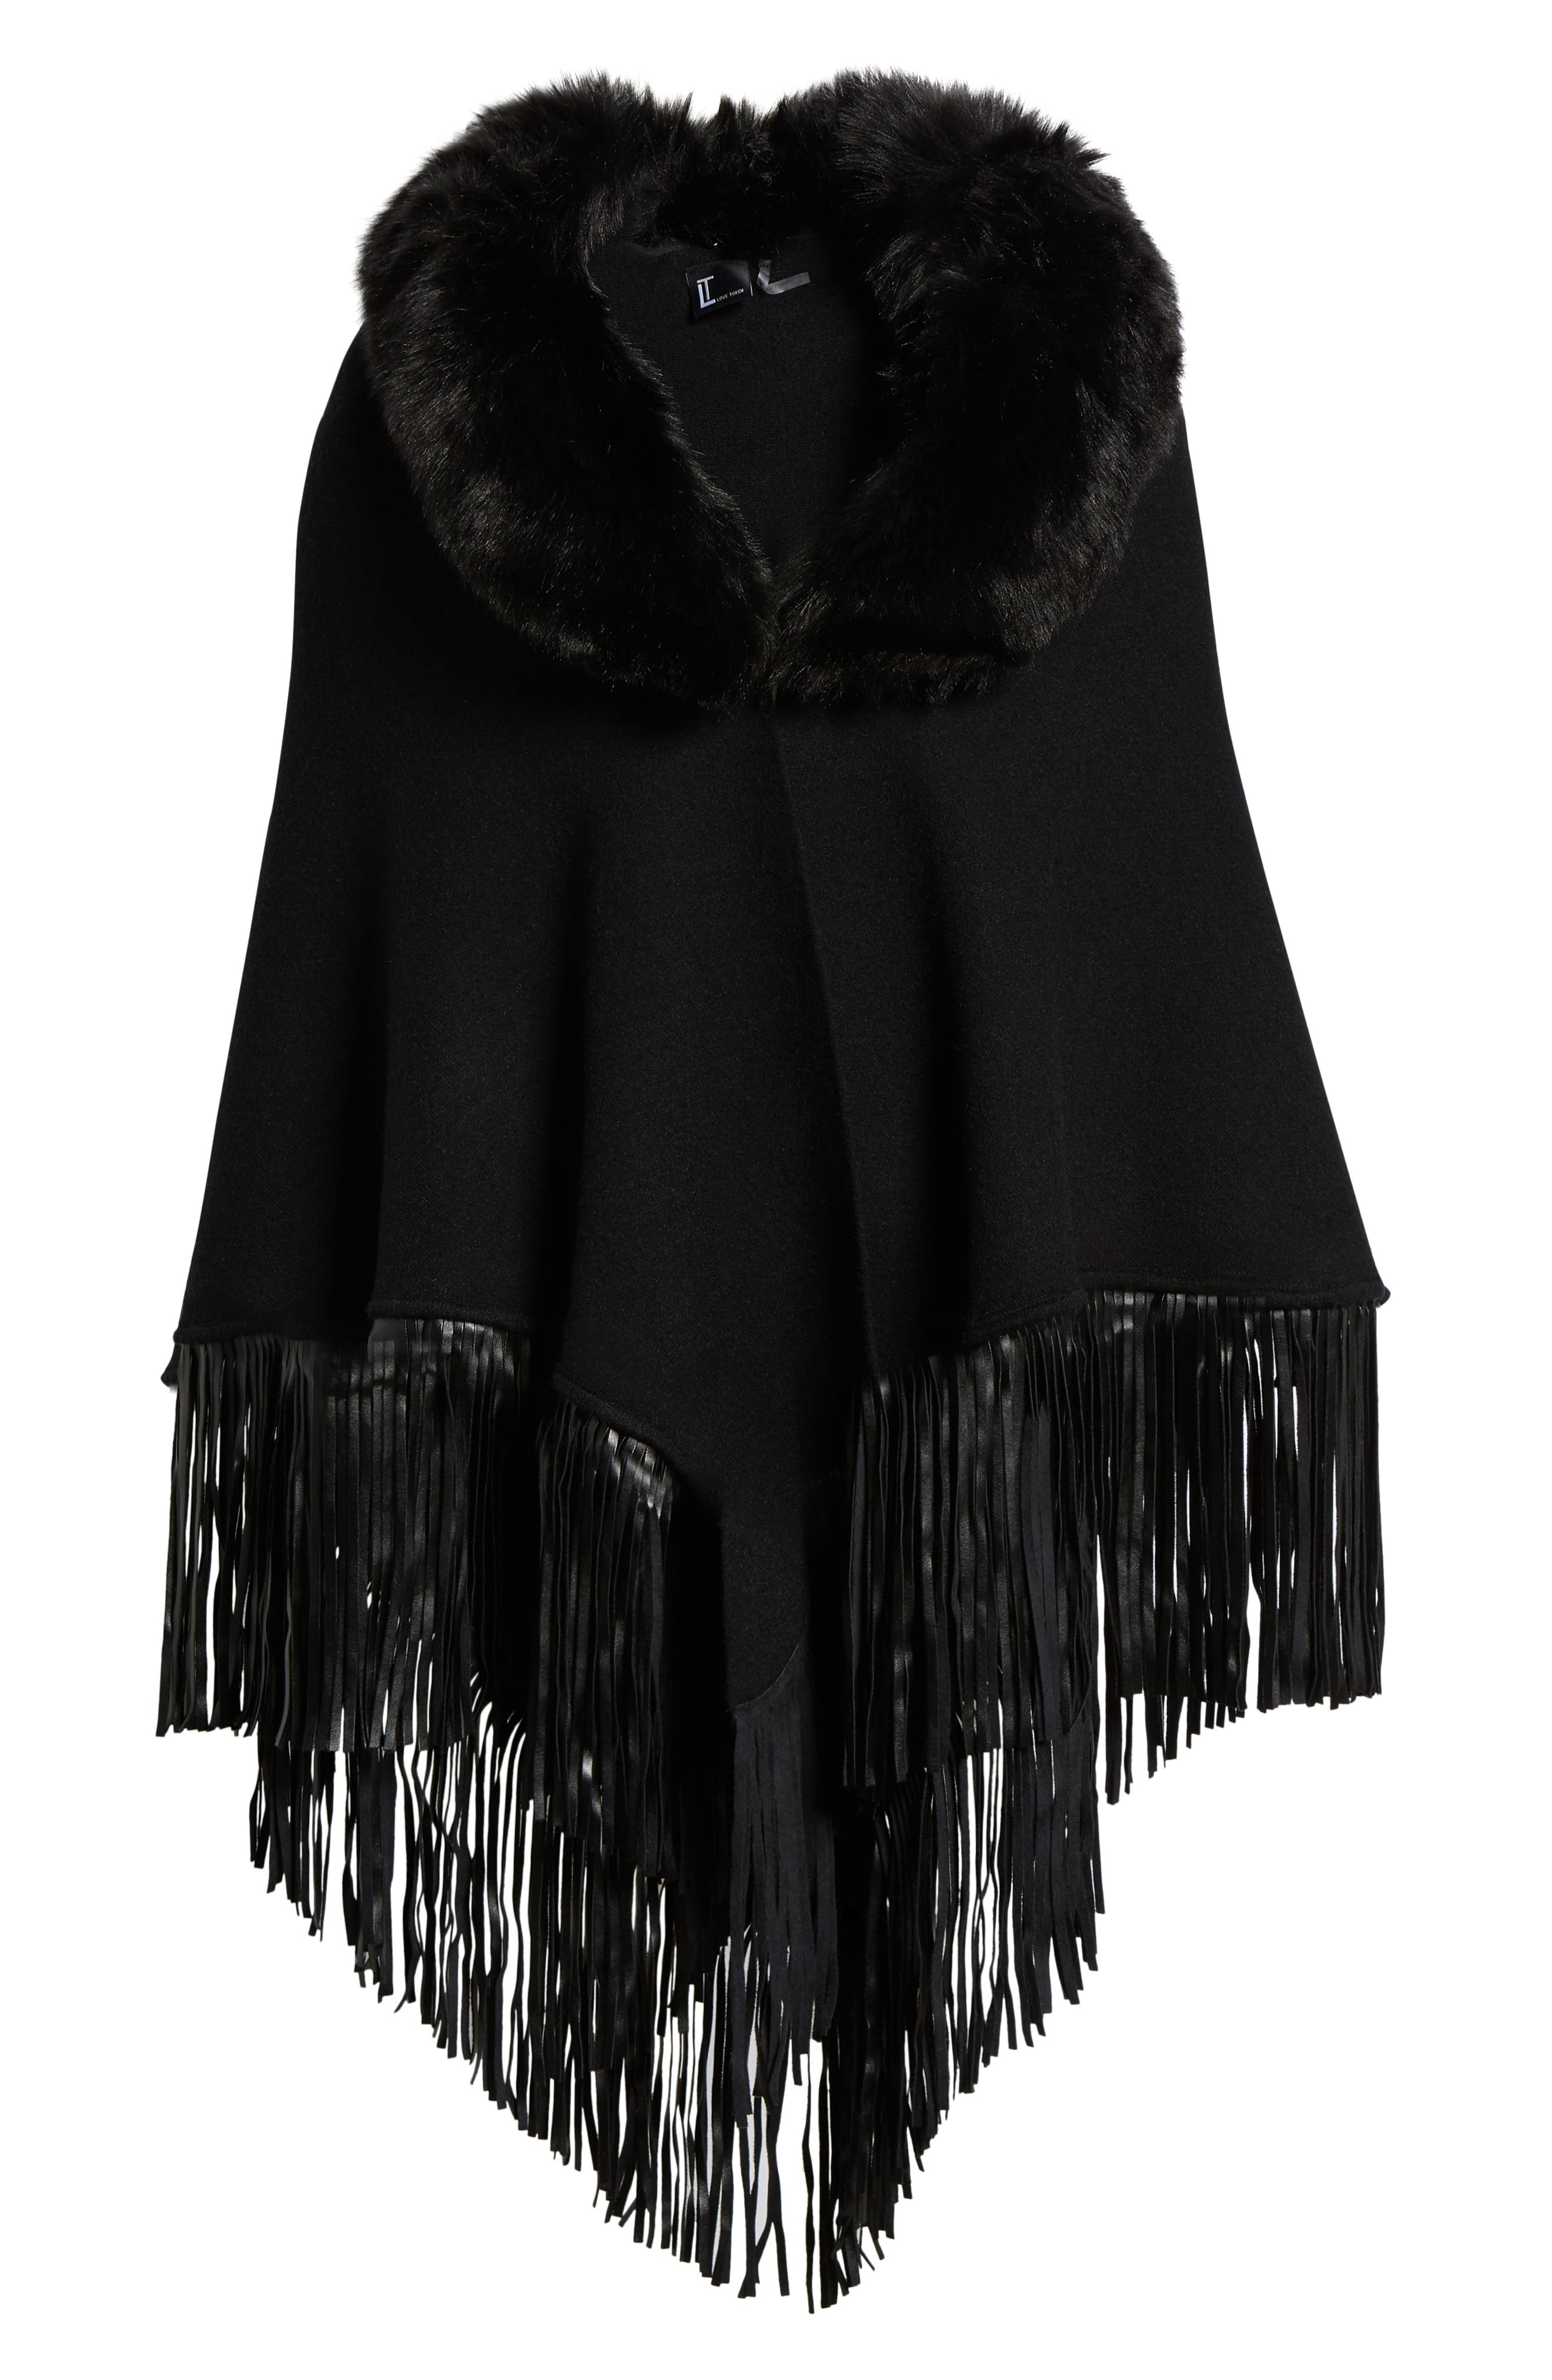 LOVE TOKEN, Fringe Poncho With Detachable Faux Fur Collar, Alternate thumbnail 6, color, 001